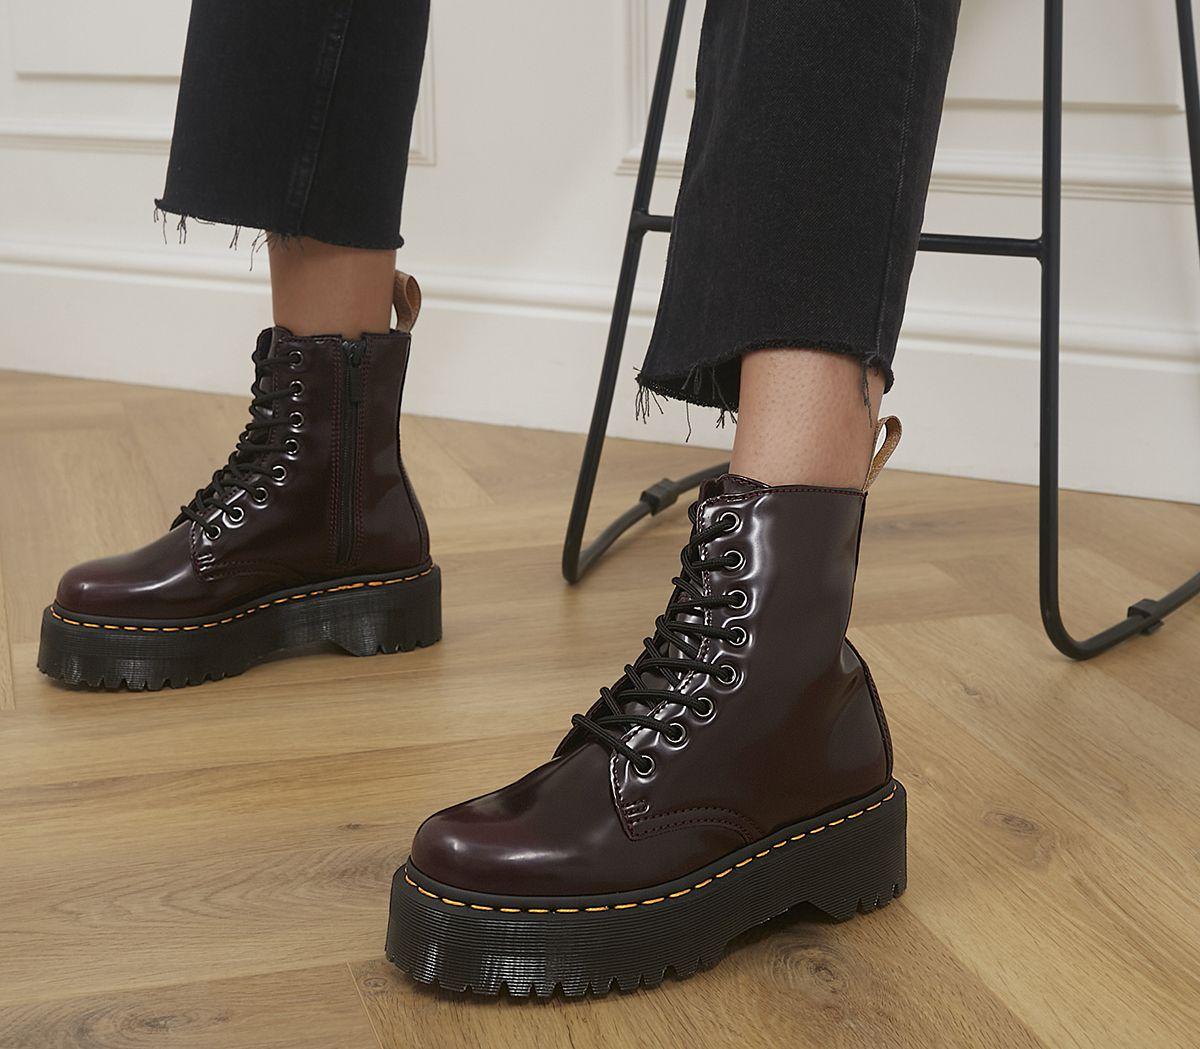 ac7171b6f7a V Jadon 8 Eye Boots